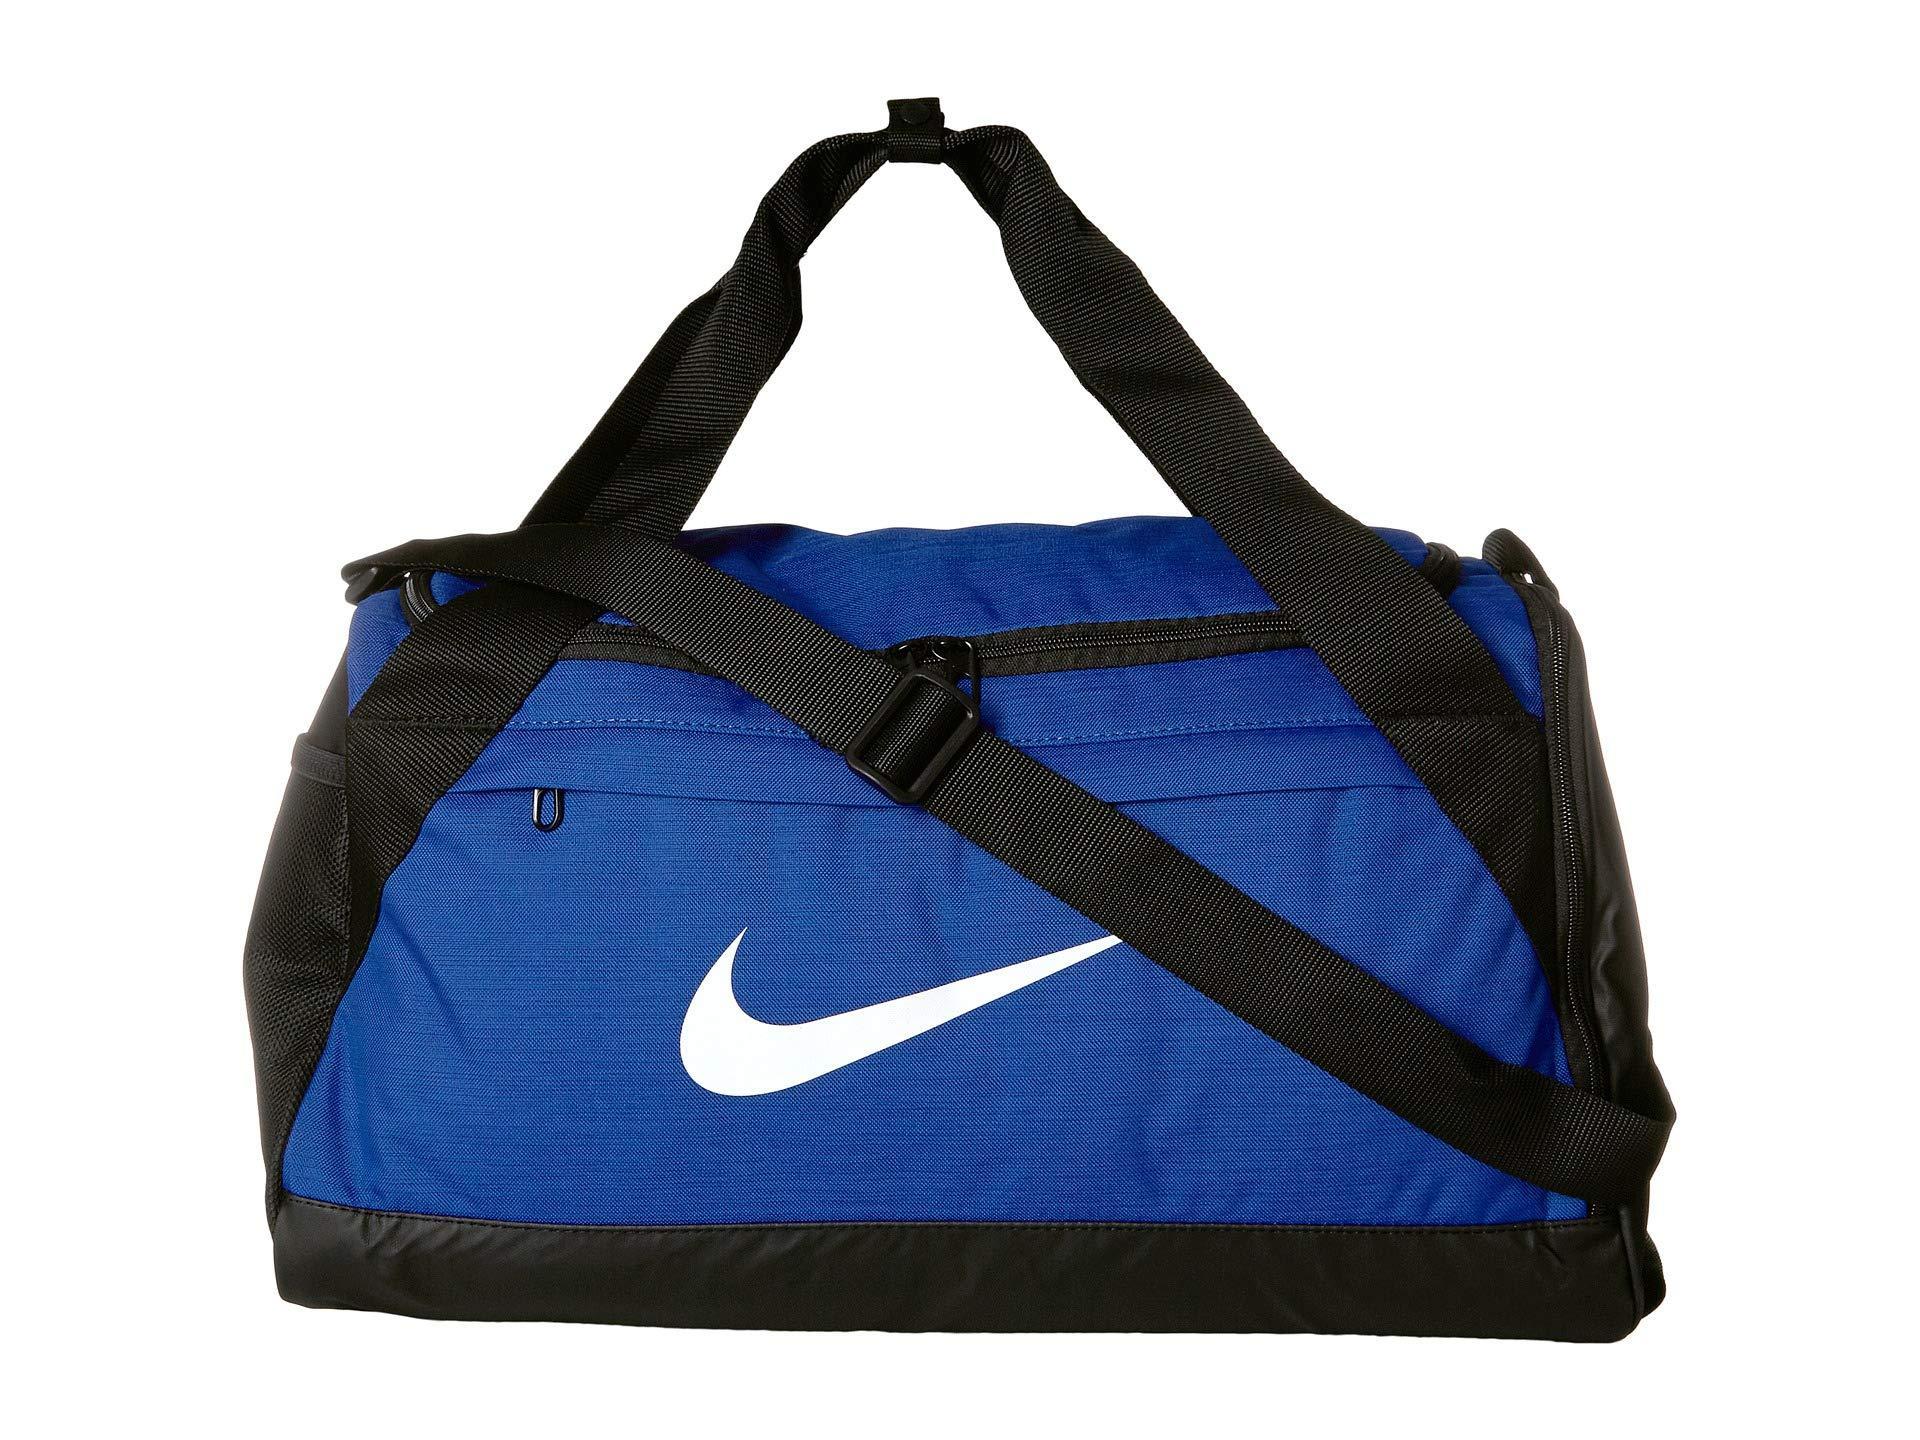 cb0d3e63ed Lyst - Nike Brasilia Small Training Duffel Bag (green Abyss black ...